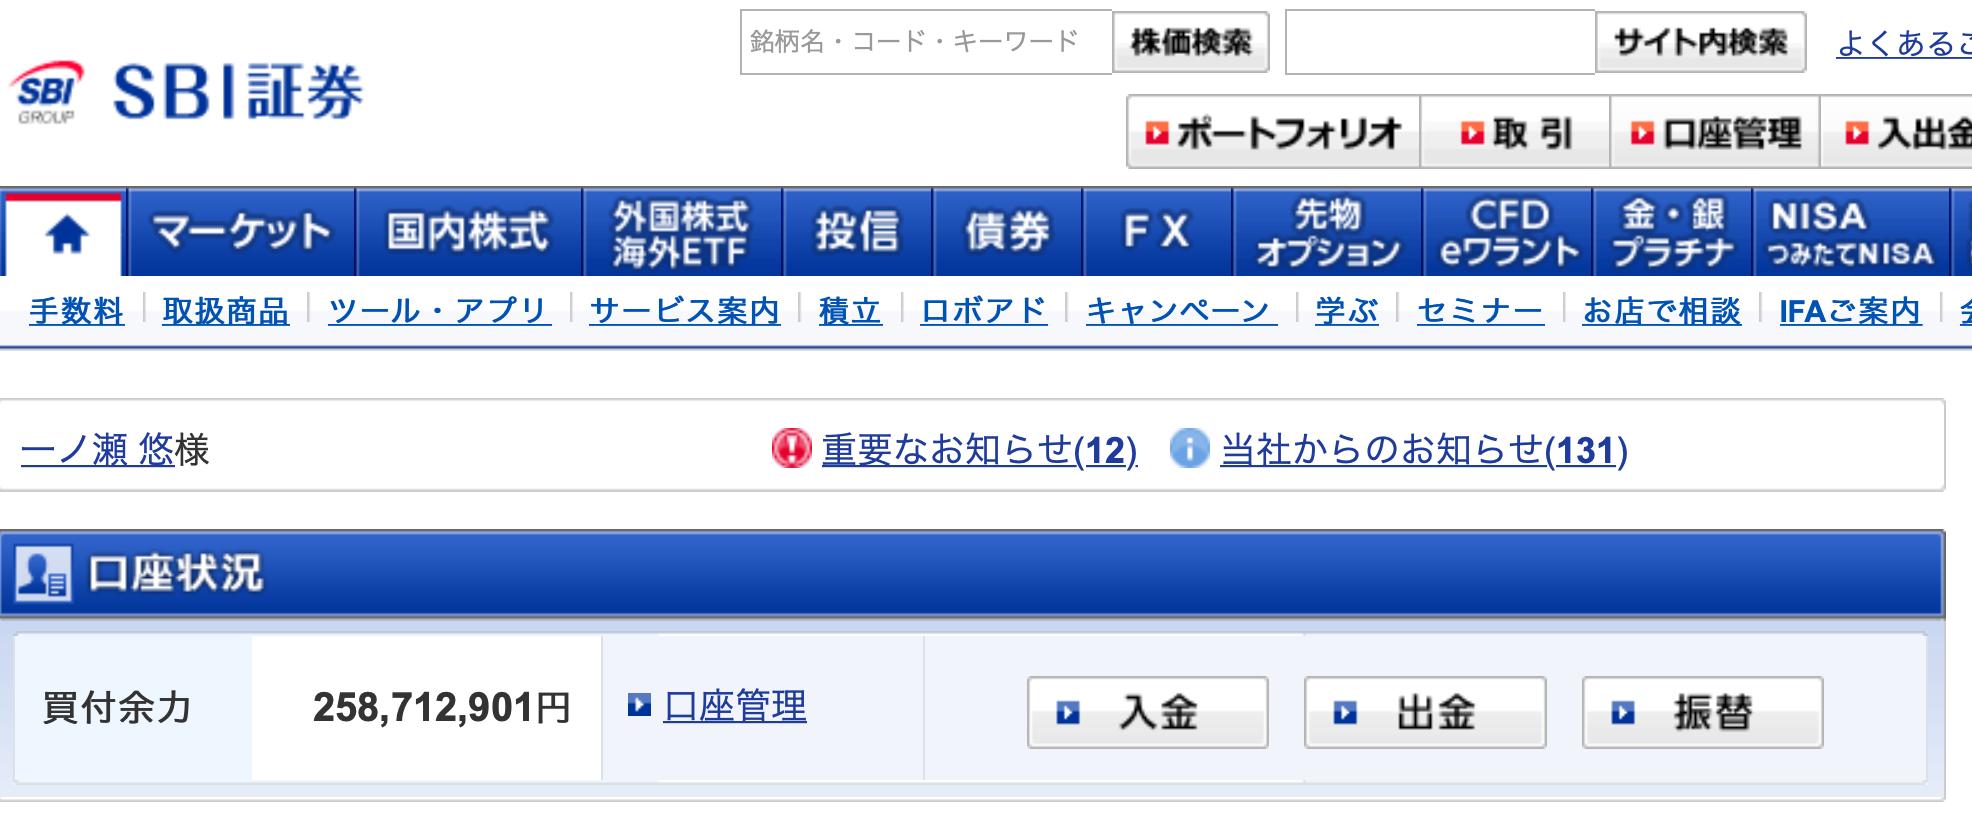 jp stock 2 - 【イキ音声あり】母乳を飲みながら乳首責めと子宮ぐりぐりセックス | 東京都八王子市